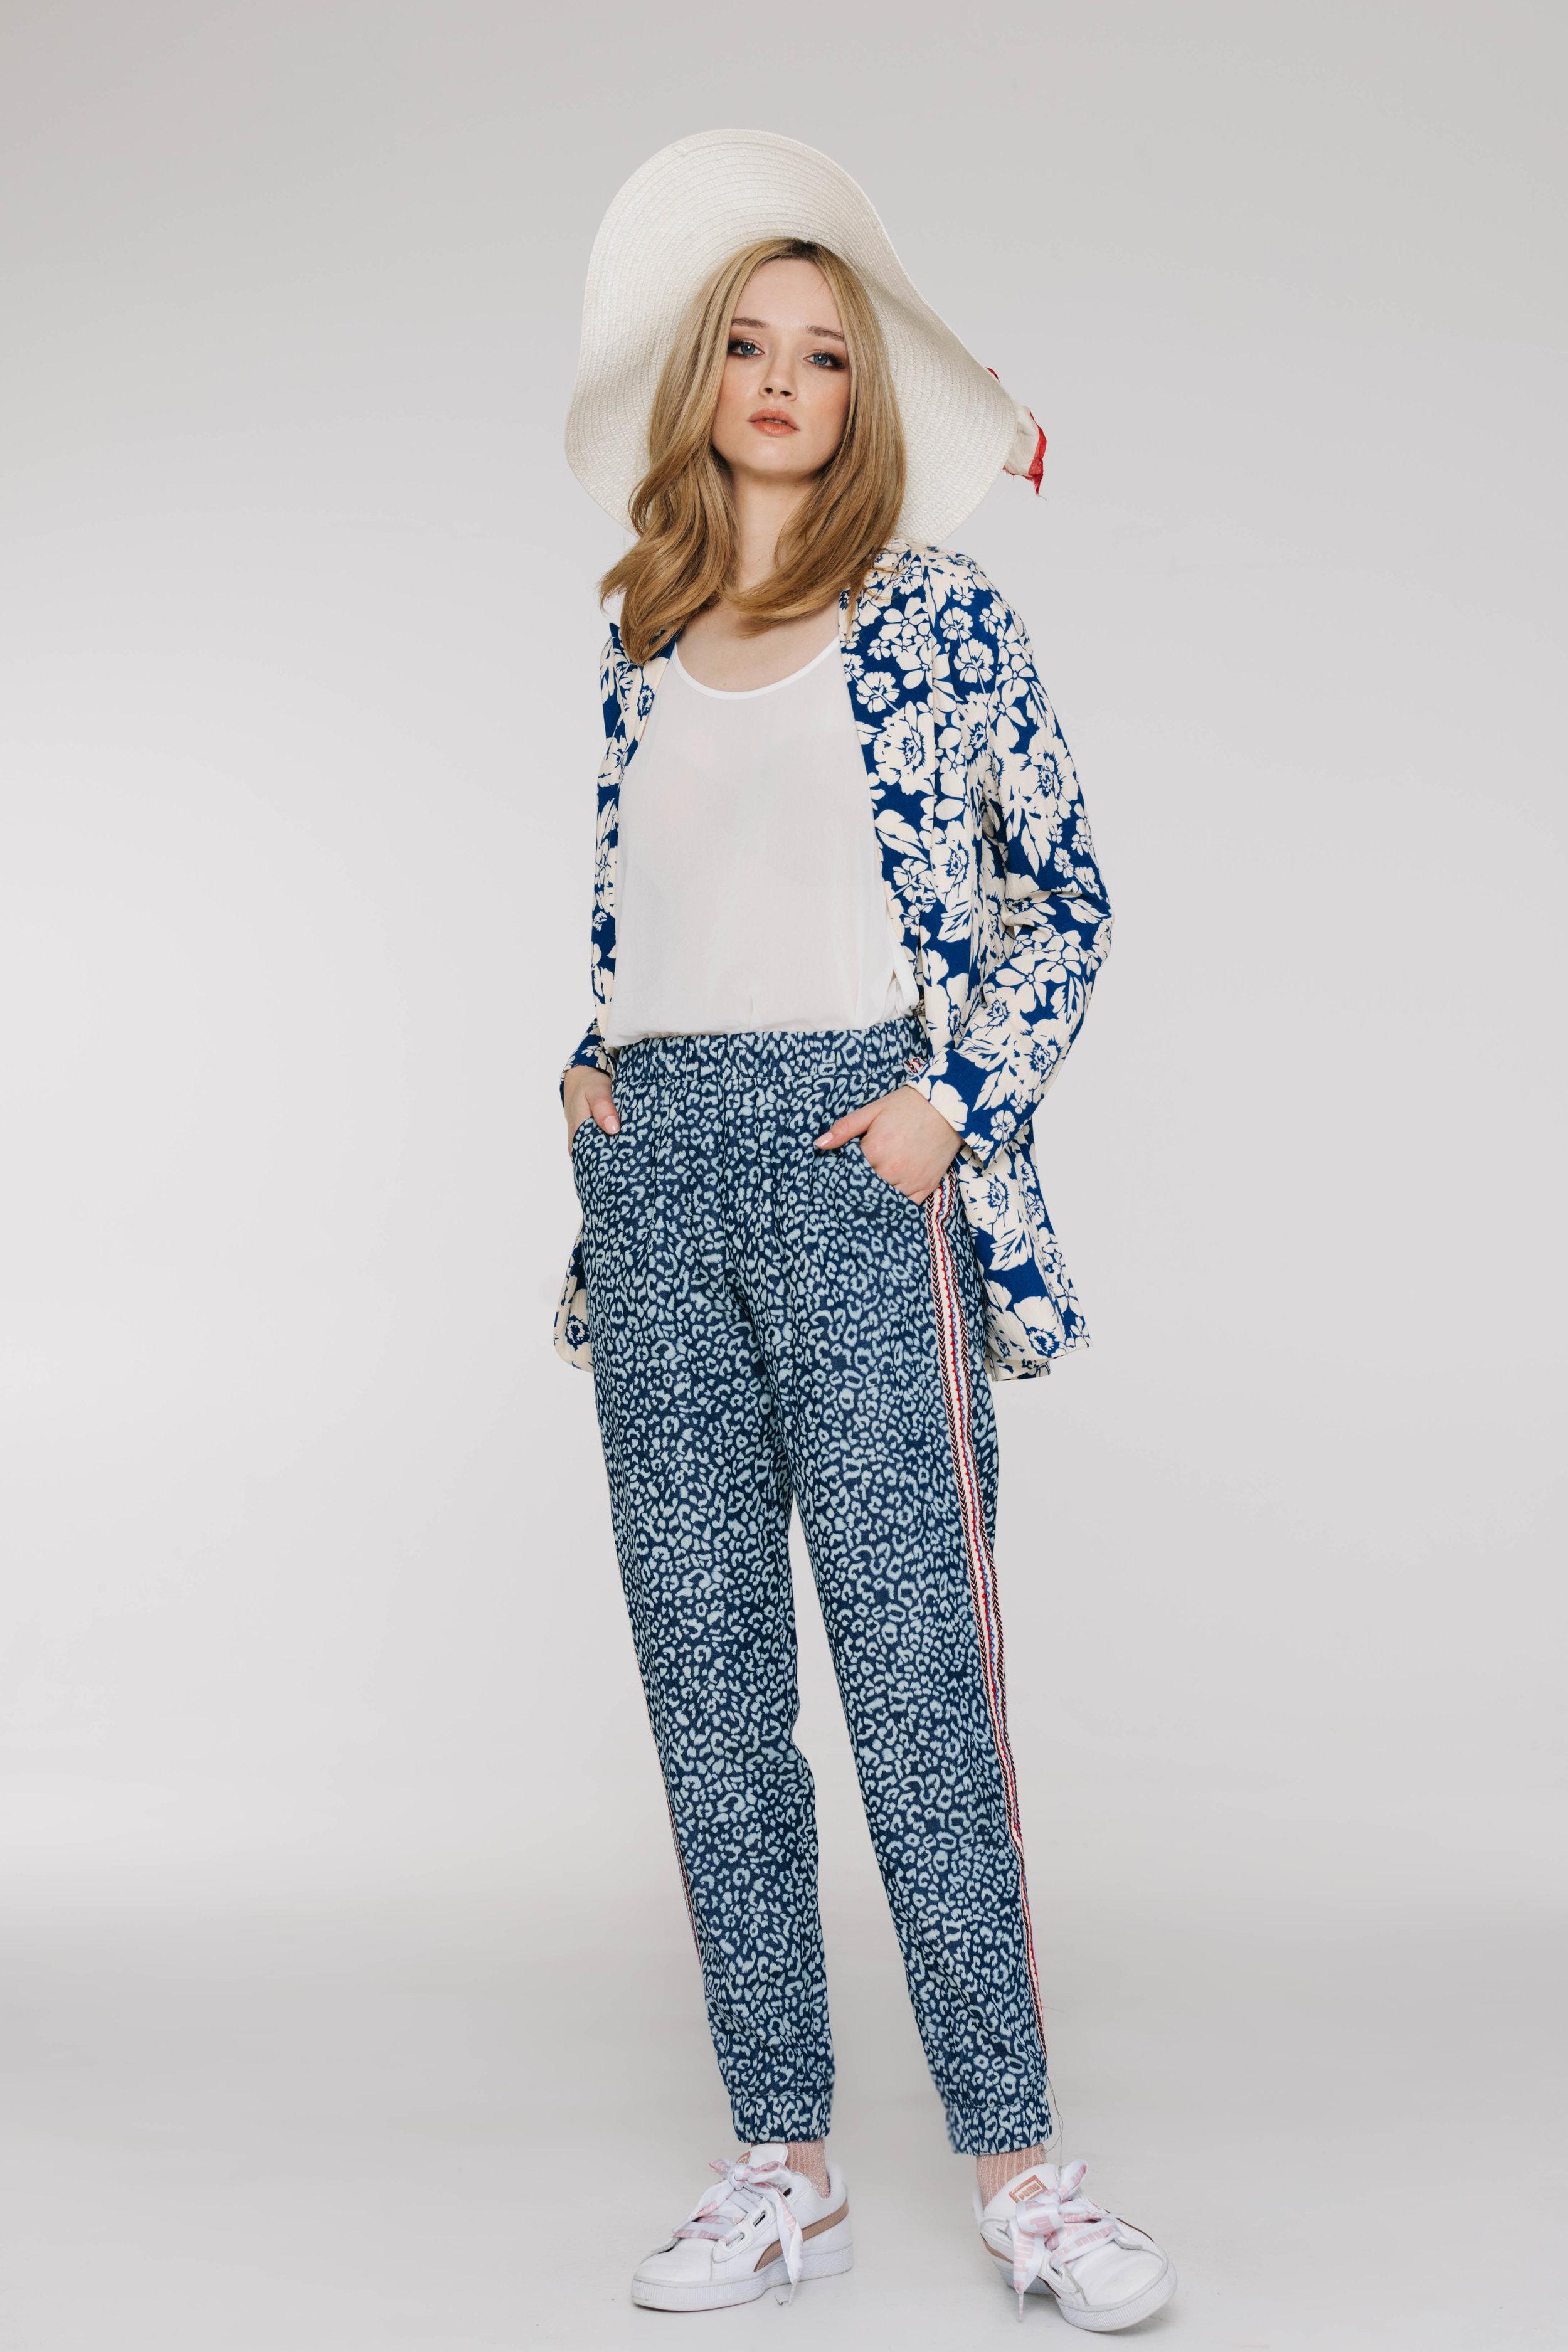 Benatar Jacket 6487N Jillian Blue, Summer Pant 4751NA Skin Denim